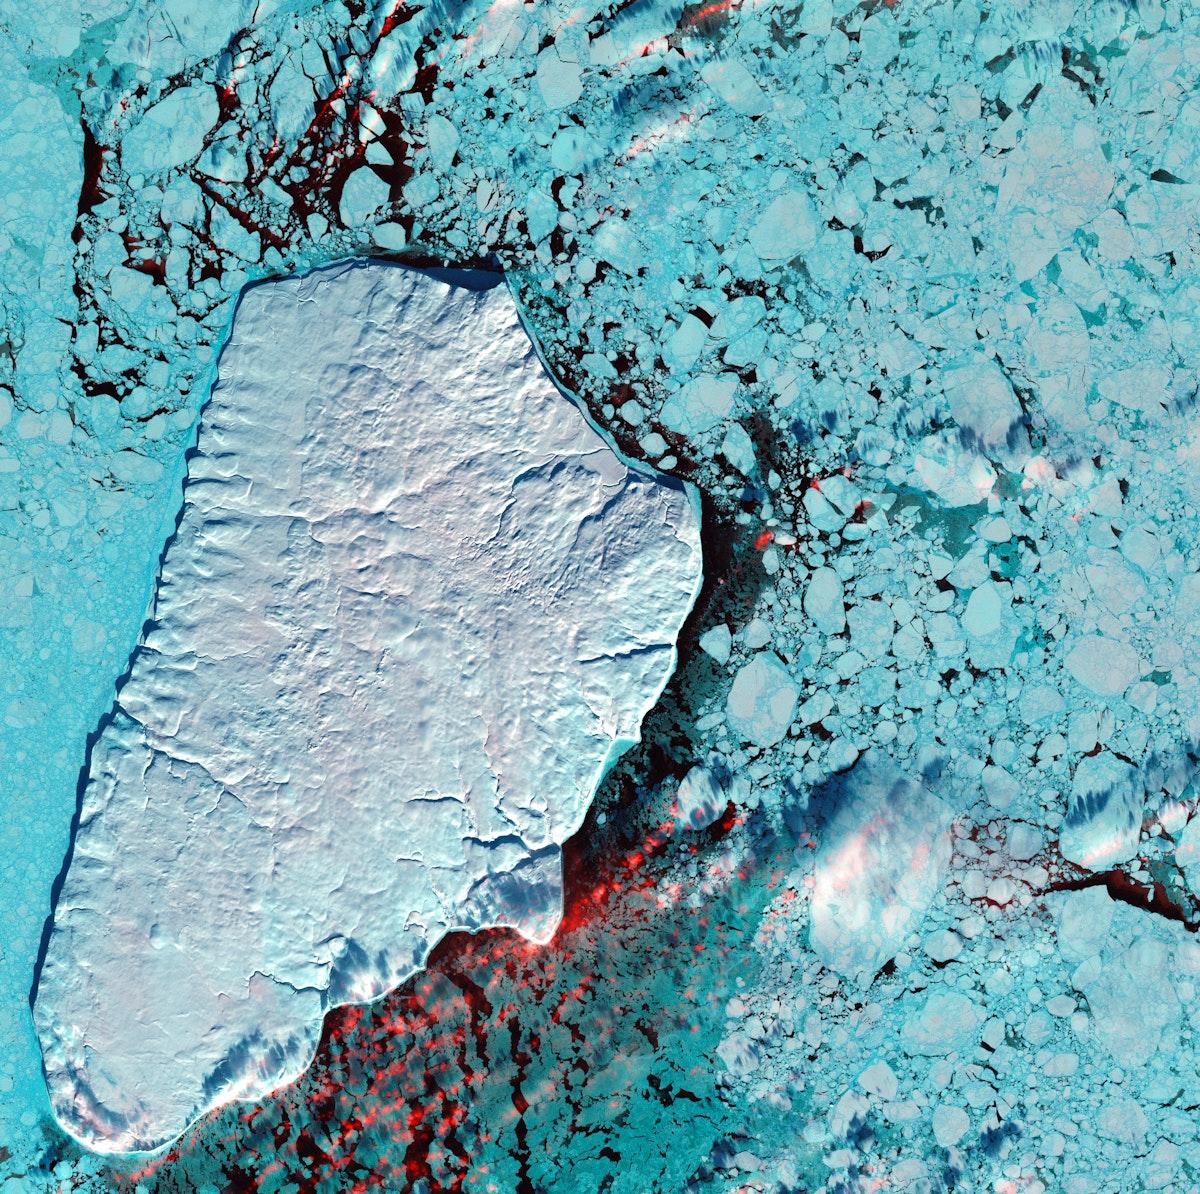 Akpatok Island in Ungava Bay in northern Quebec, Canada. Original from NASA. Digitally enhanced by rawpixel.